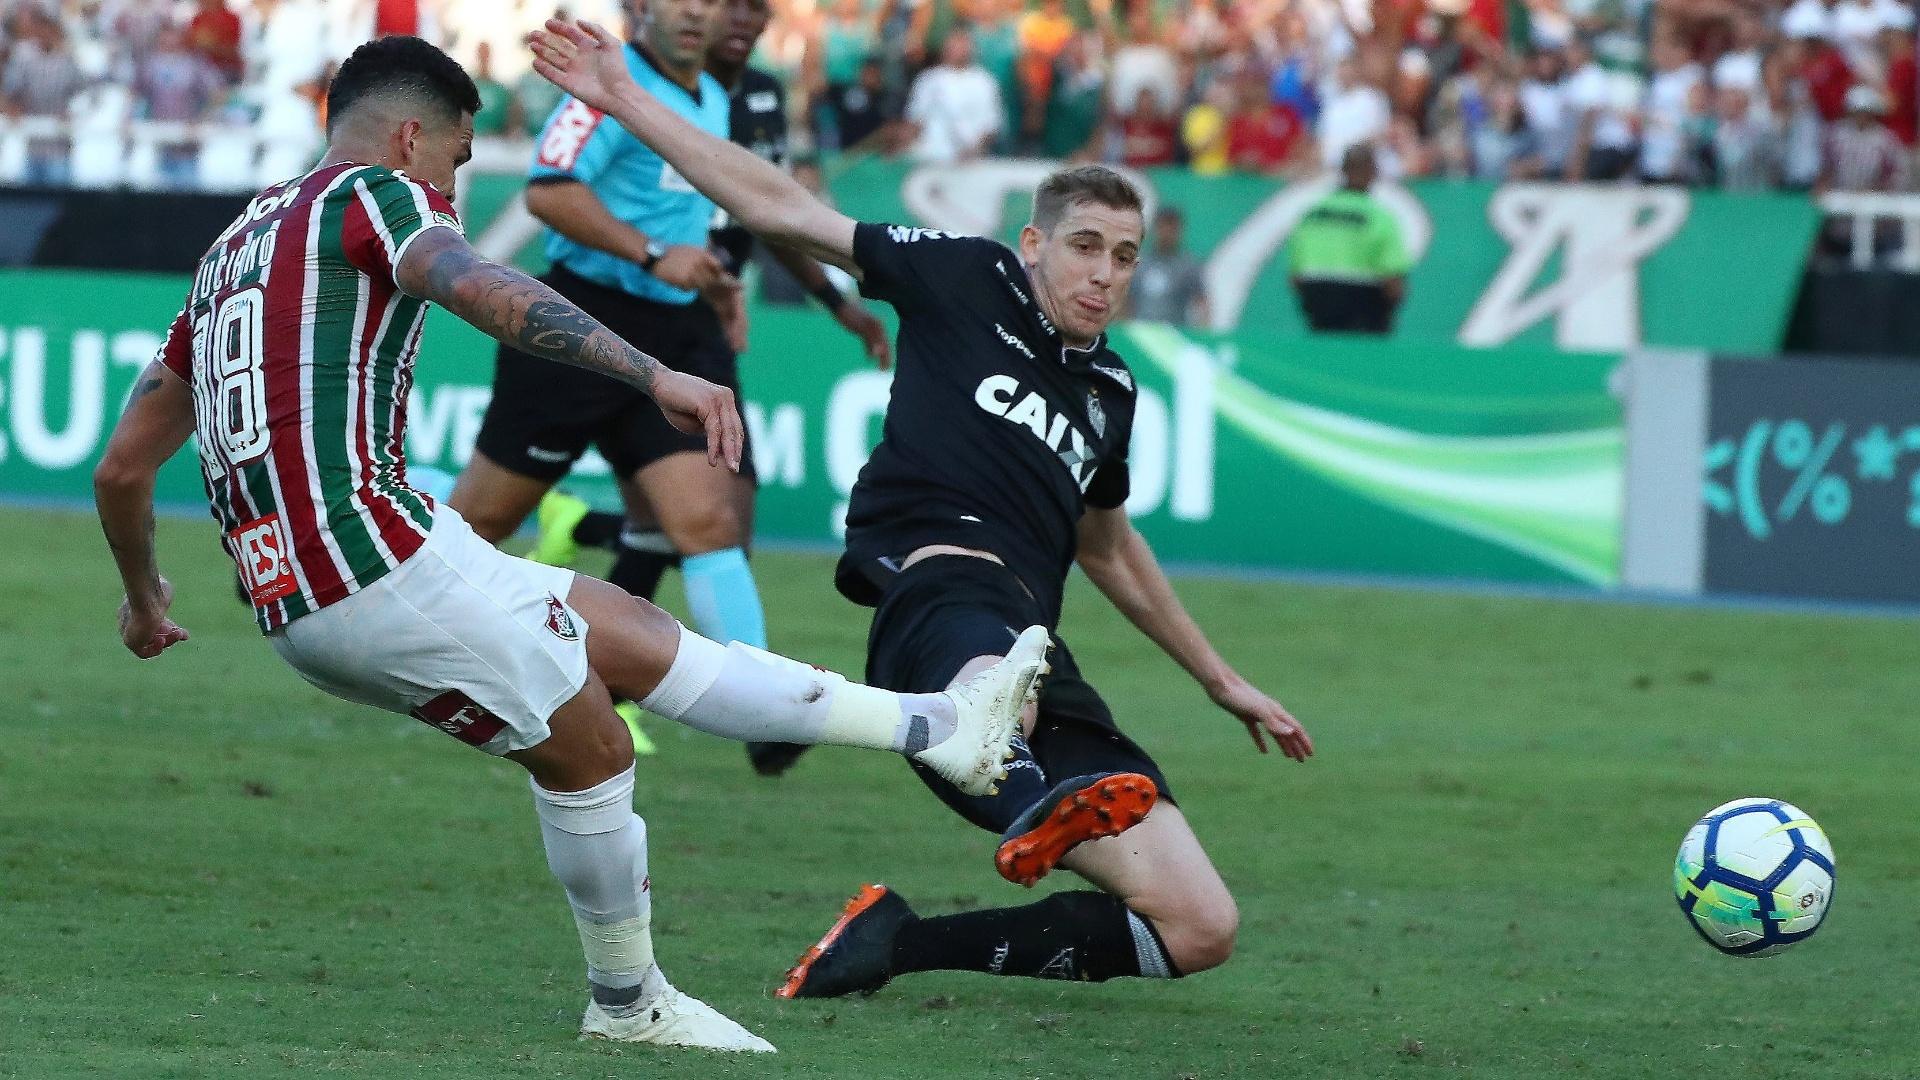 Luciano chuta para anotar o gol do Fluminense diante do Atlético-MG